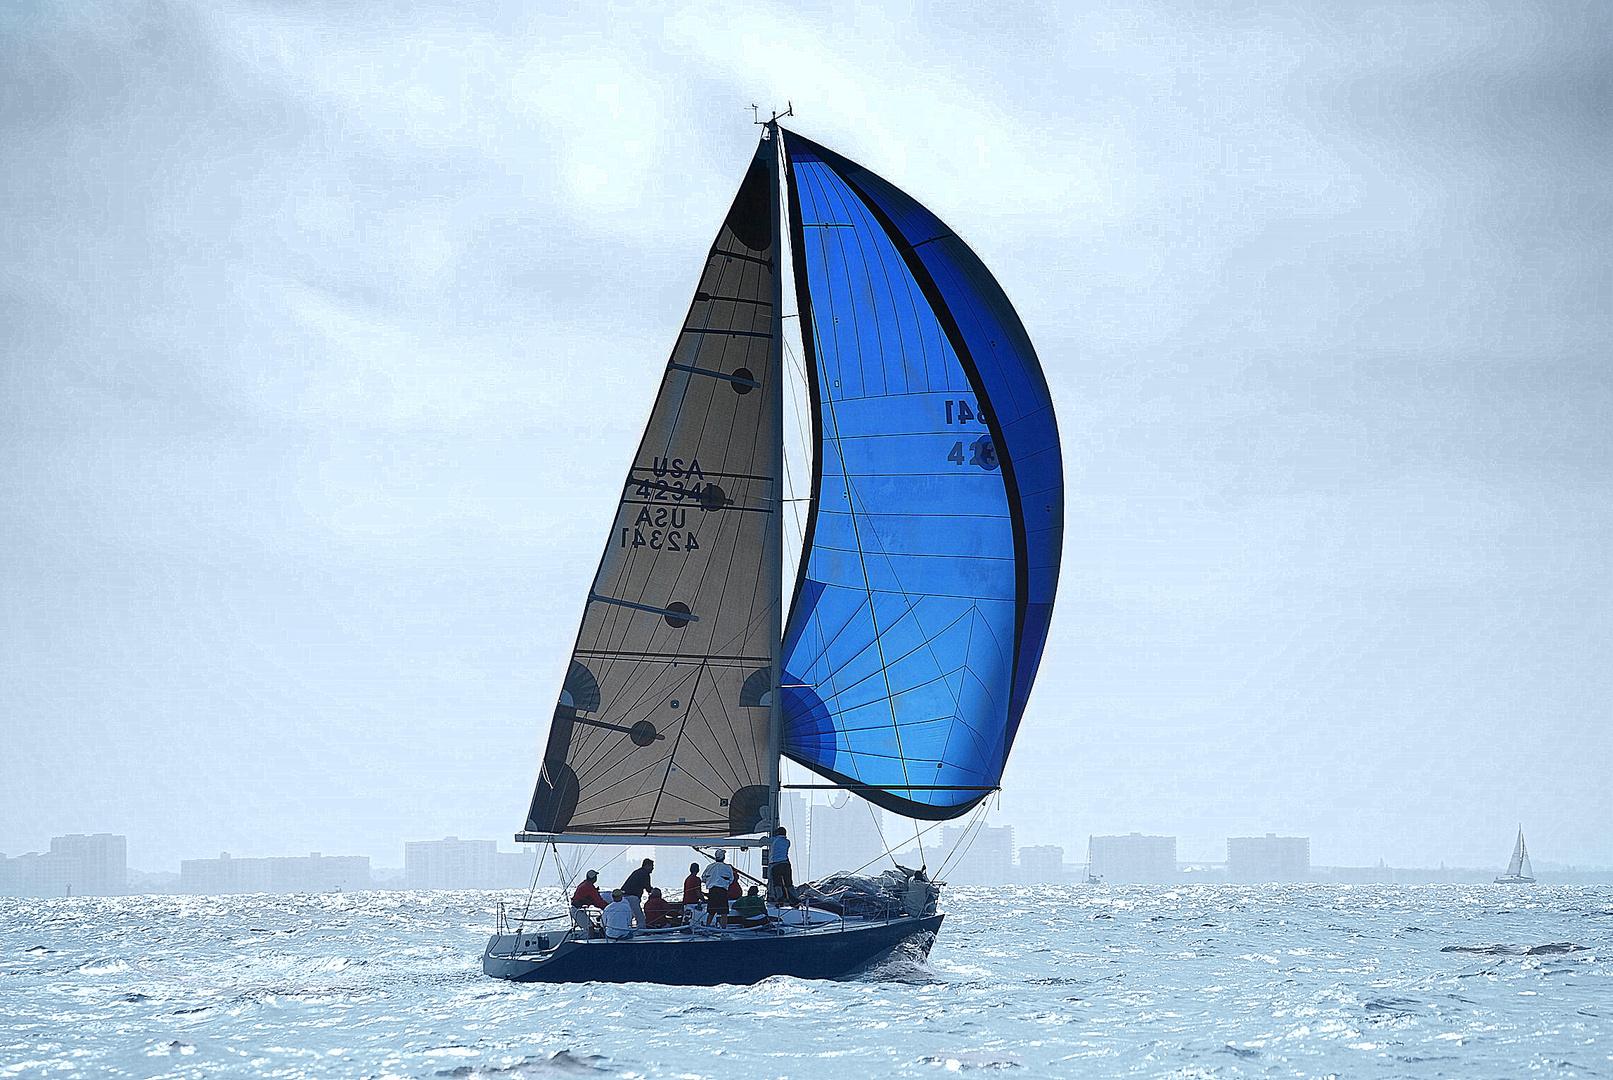 El velero azul